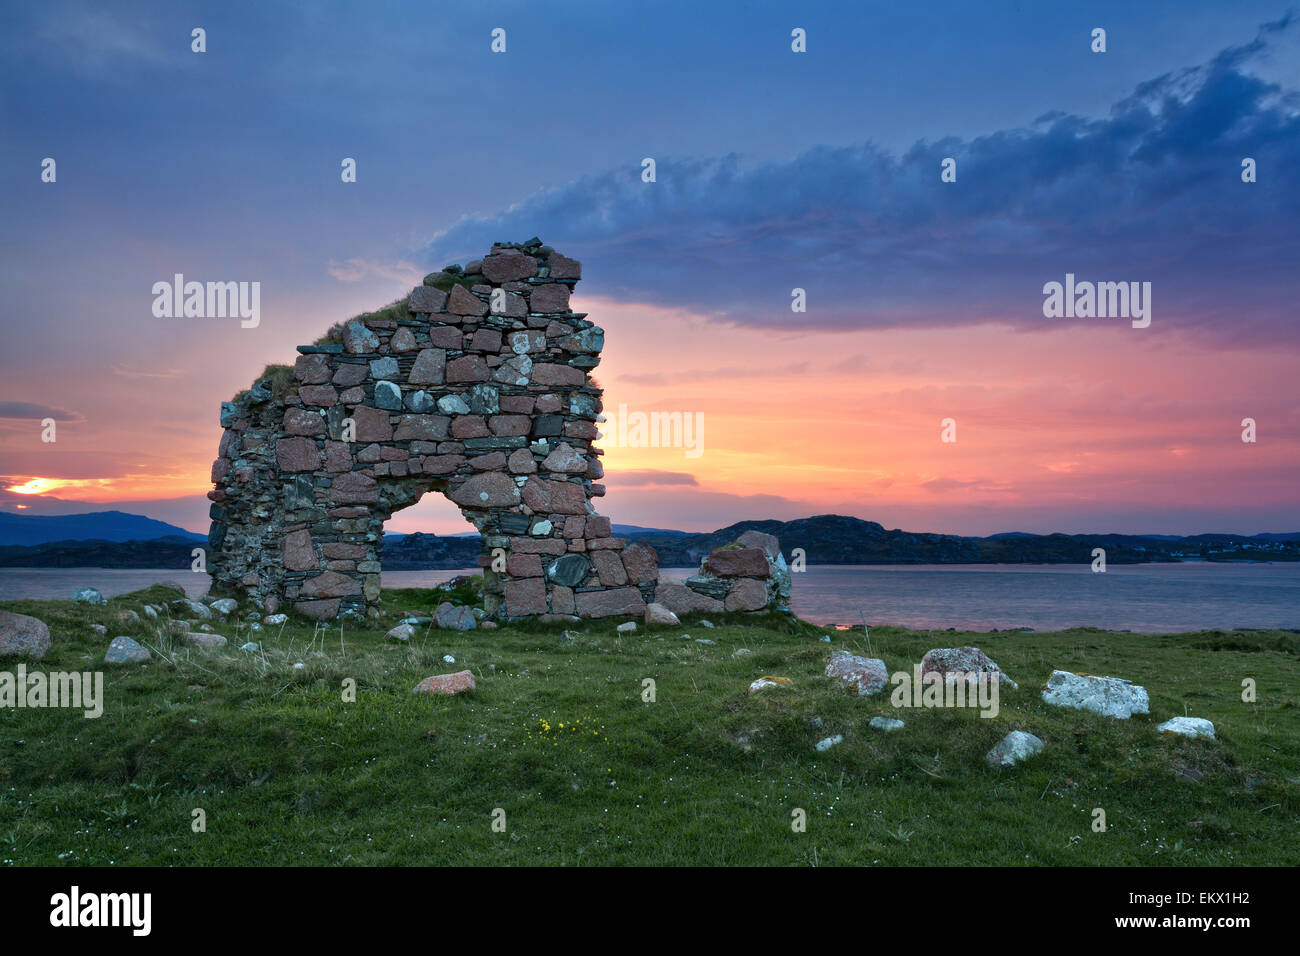 Ruins at sunrise on the isle of Iona, Scotland - Stock Image